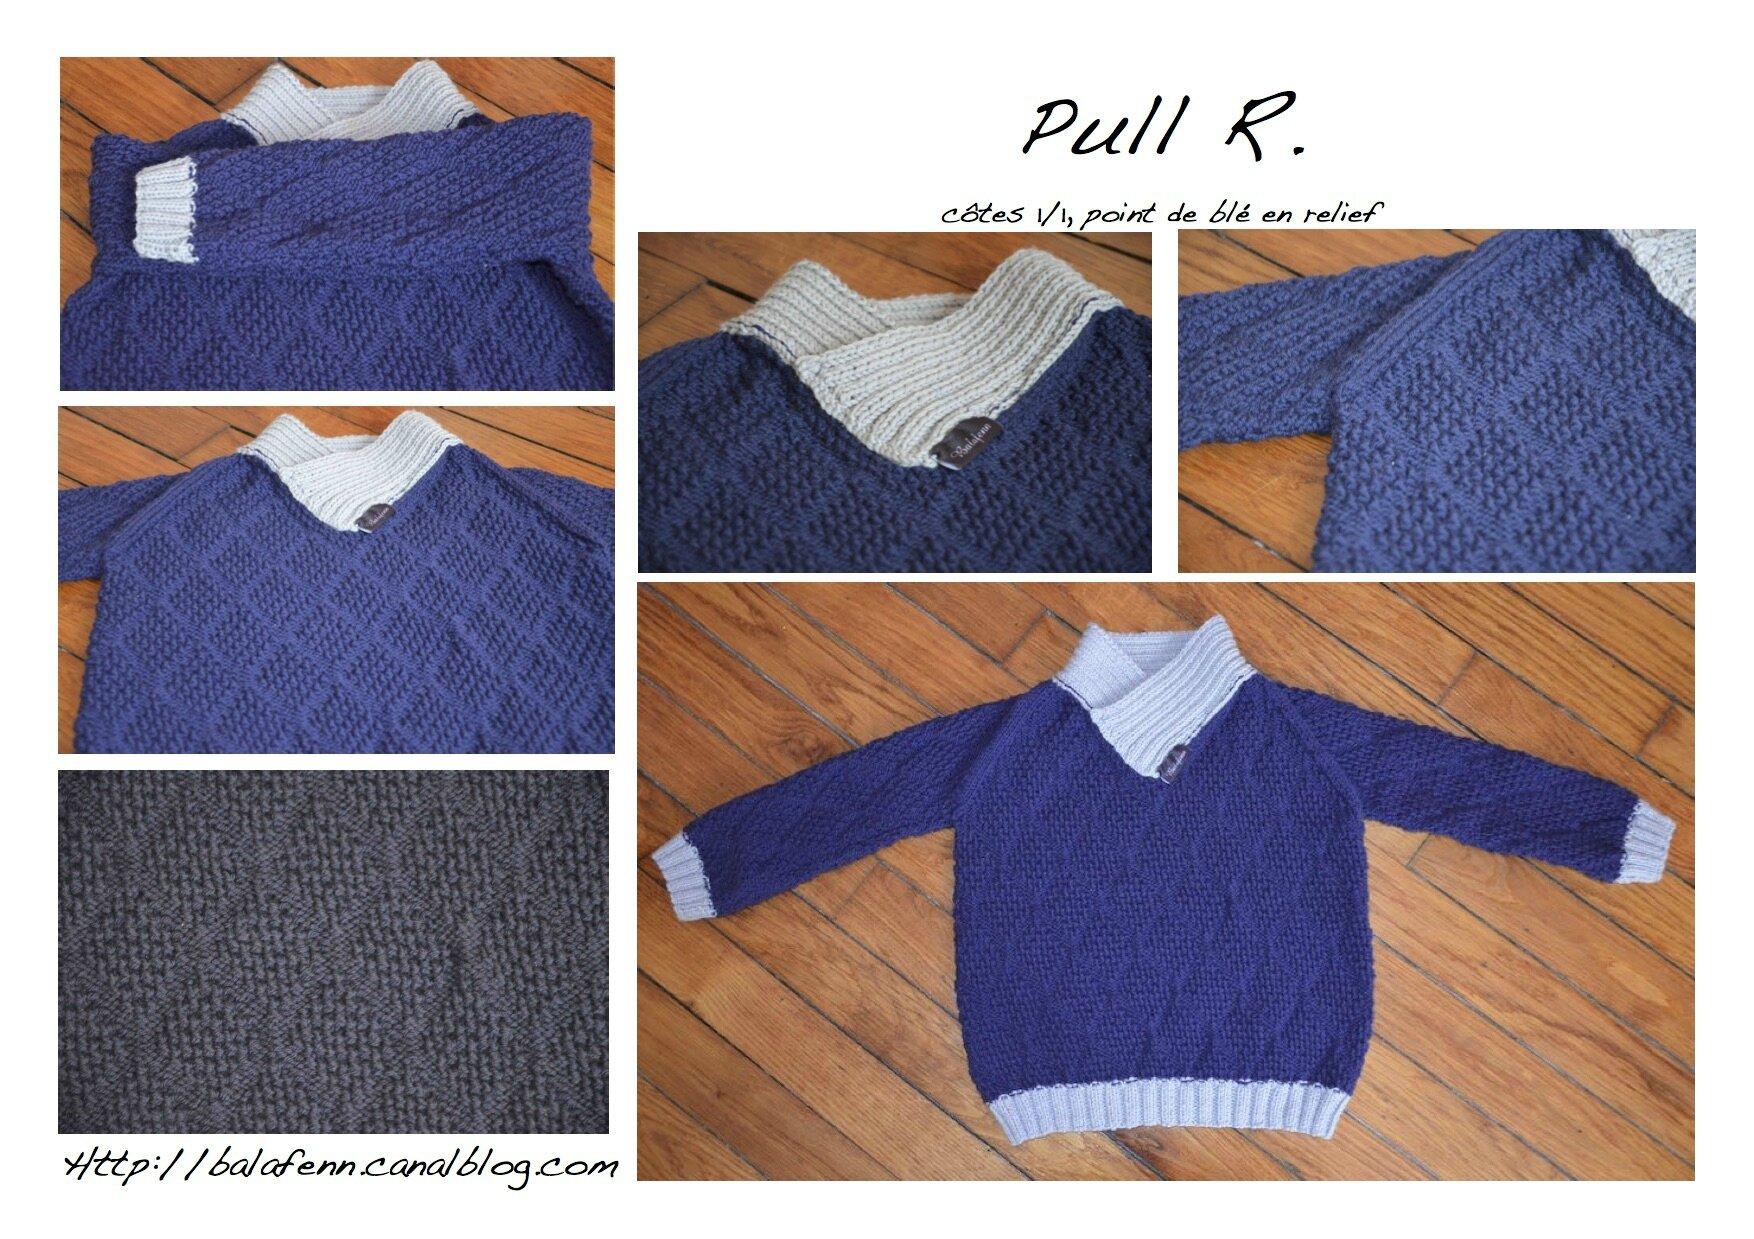 Pull R.